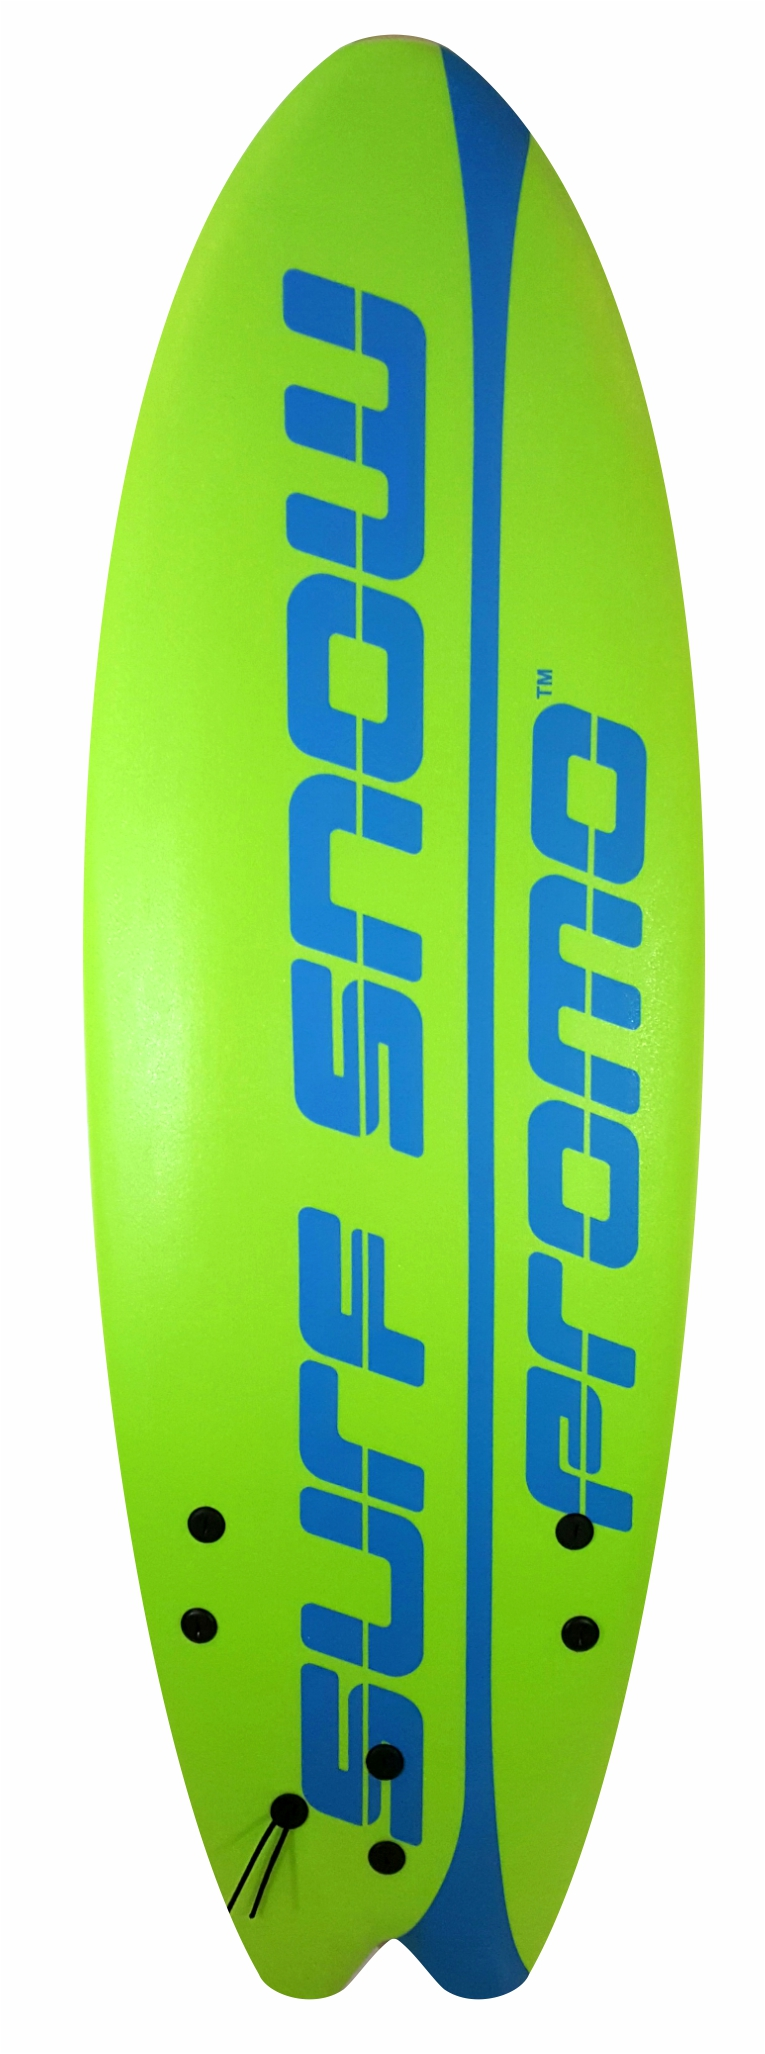 68 Inch Surfboard - Softtop.jpg